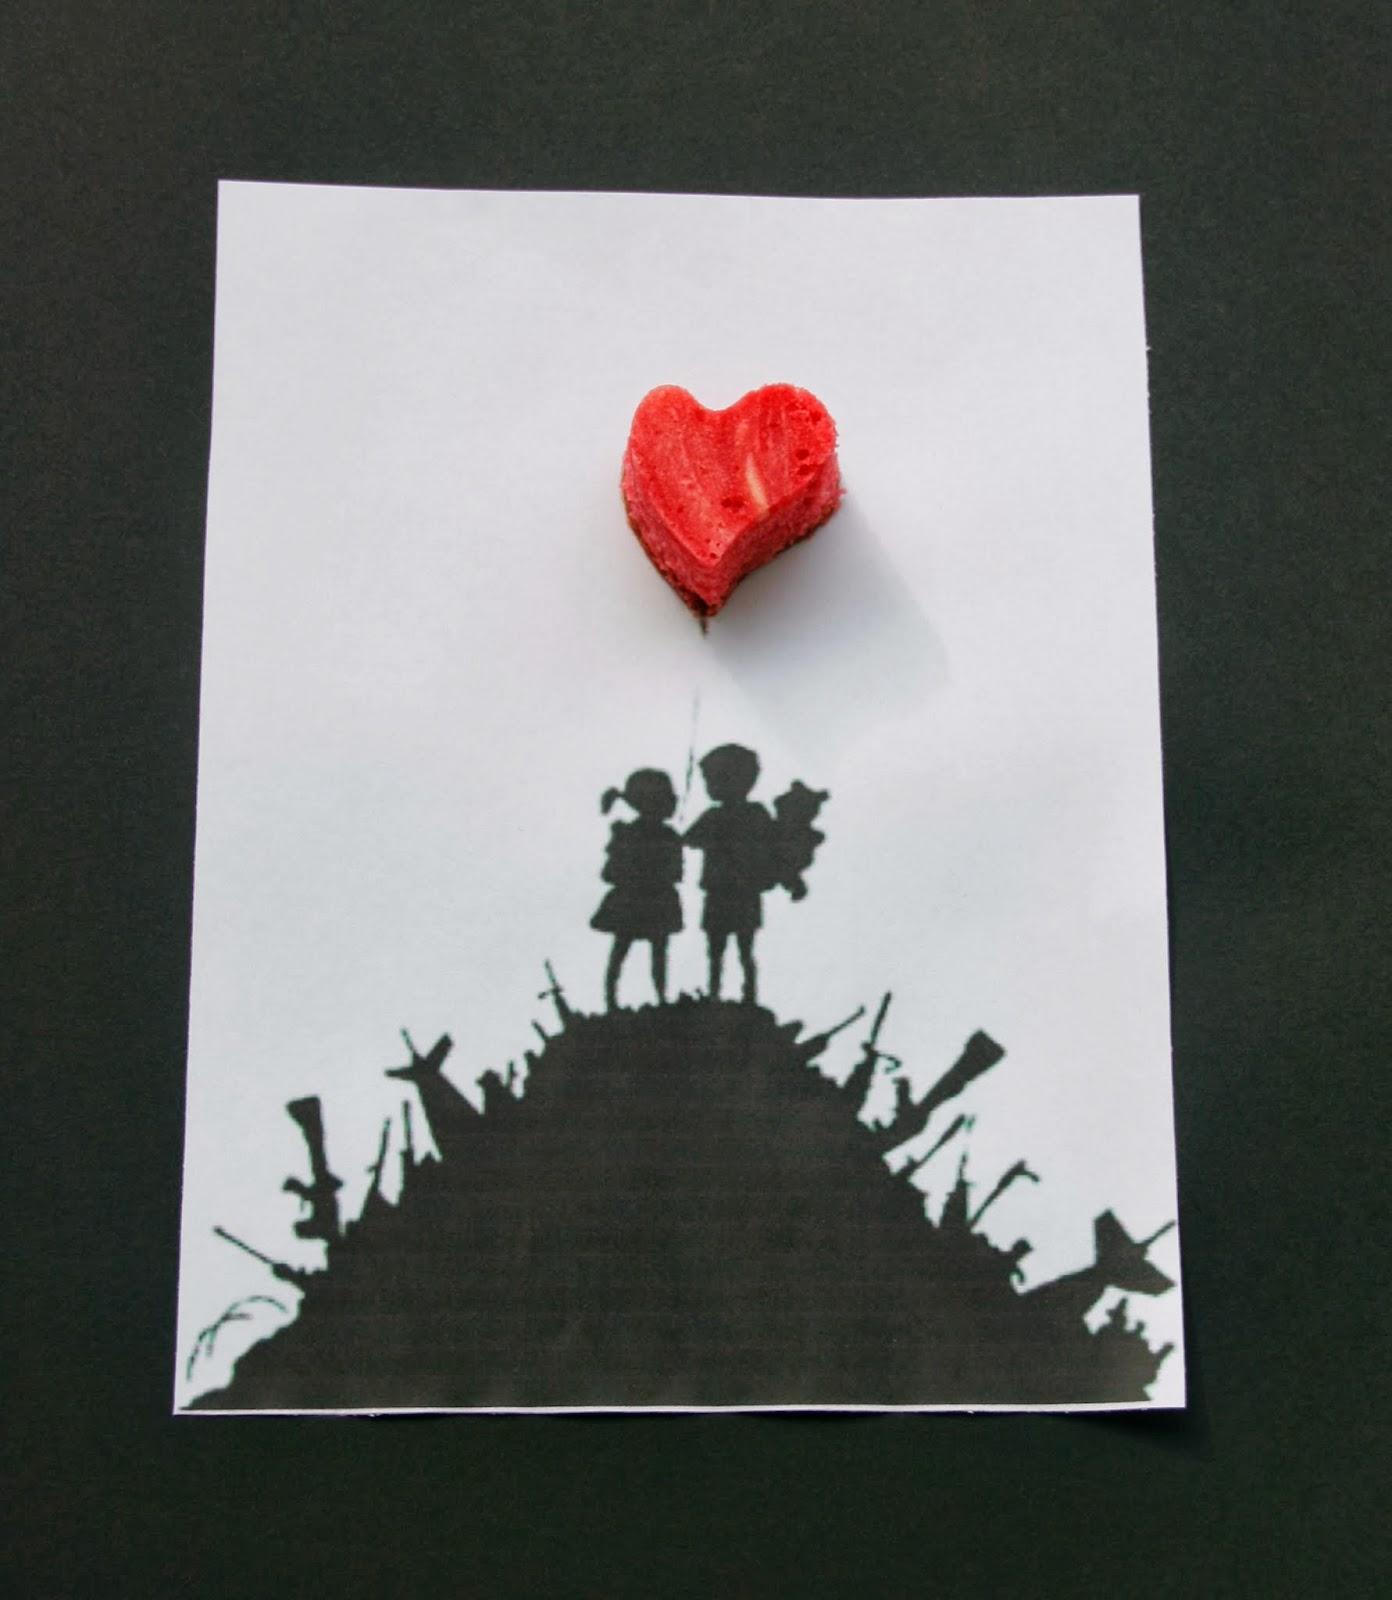 Imatge de parella de nens de Banksy amb cor de cheescake red velvet brownie